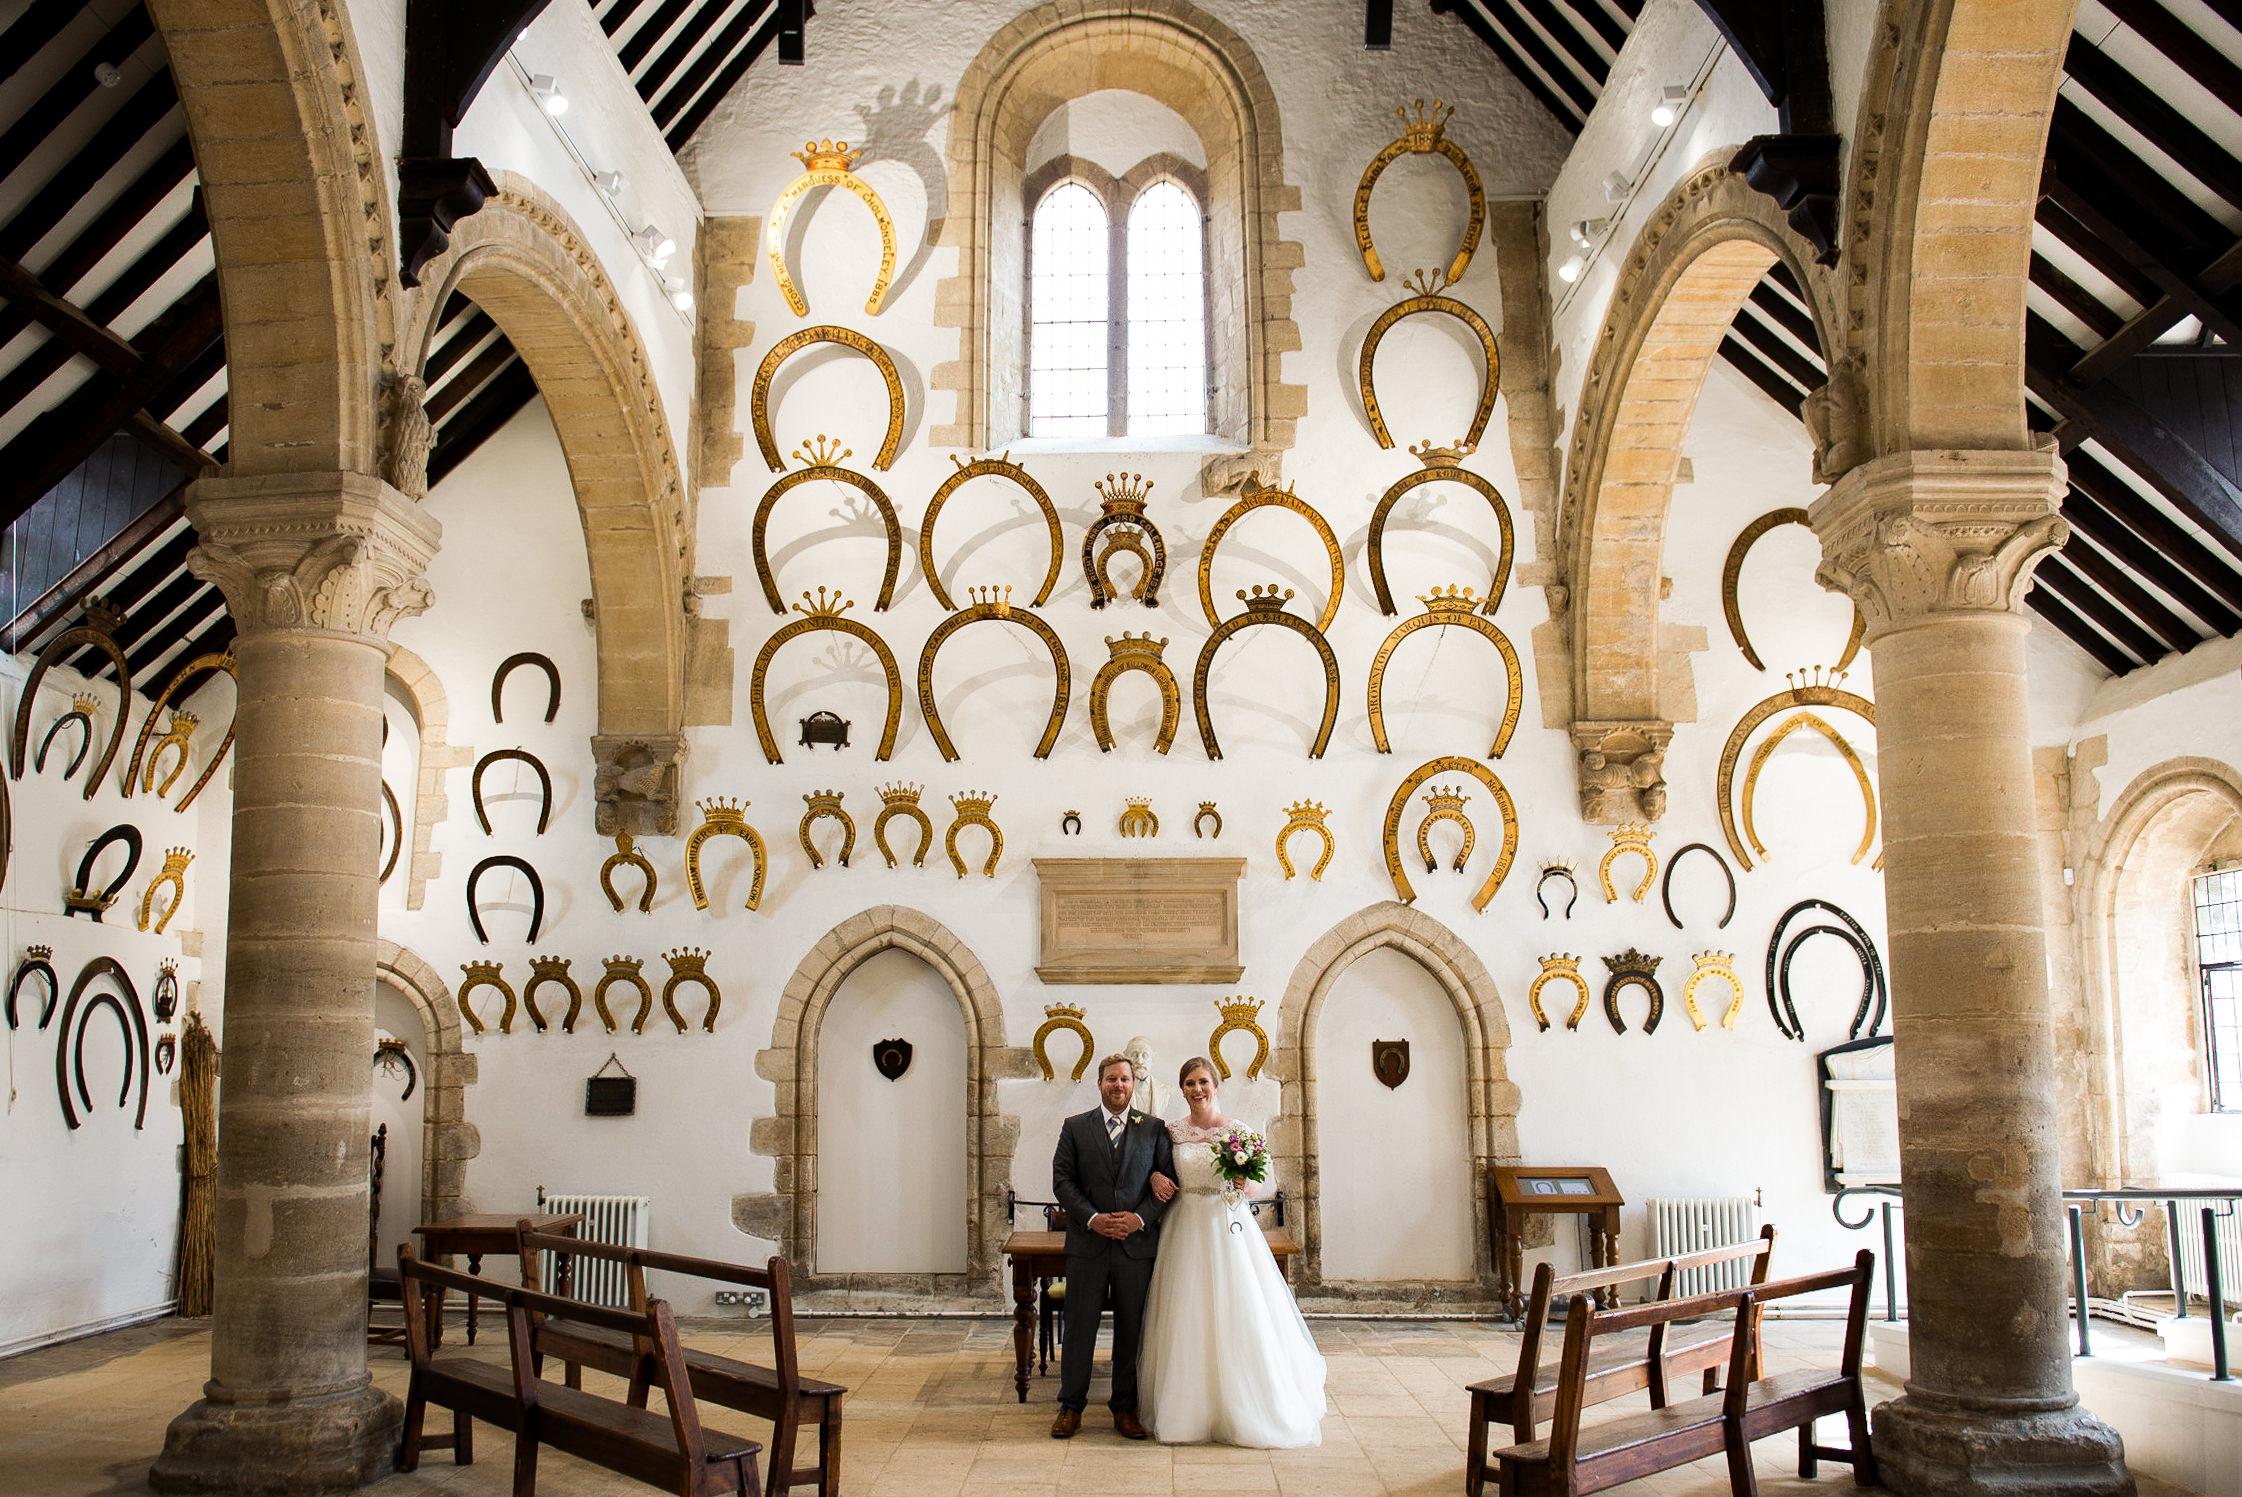 Oakham Castle wedding